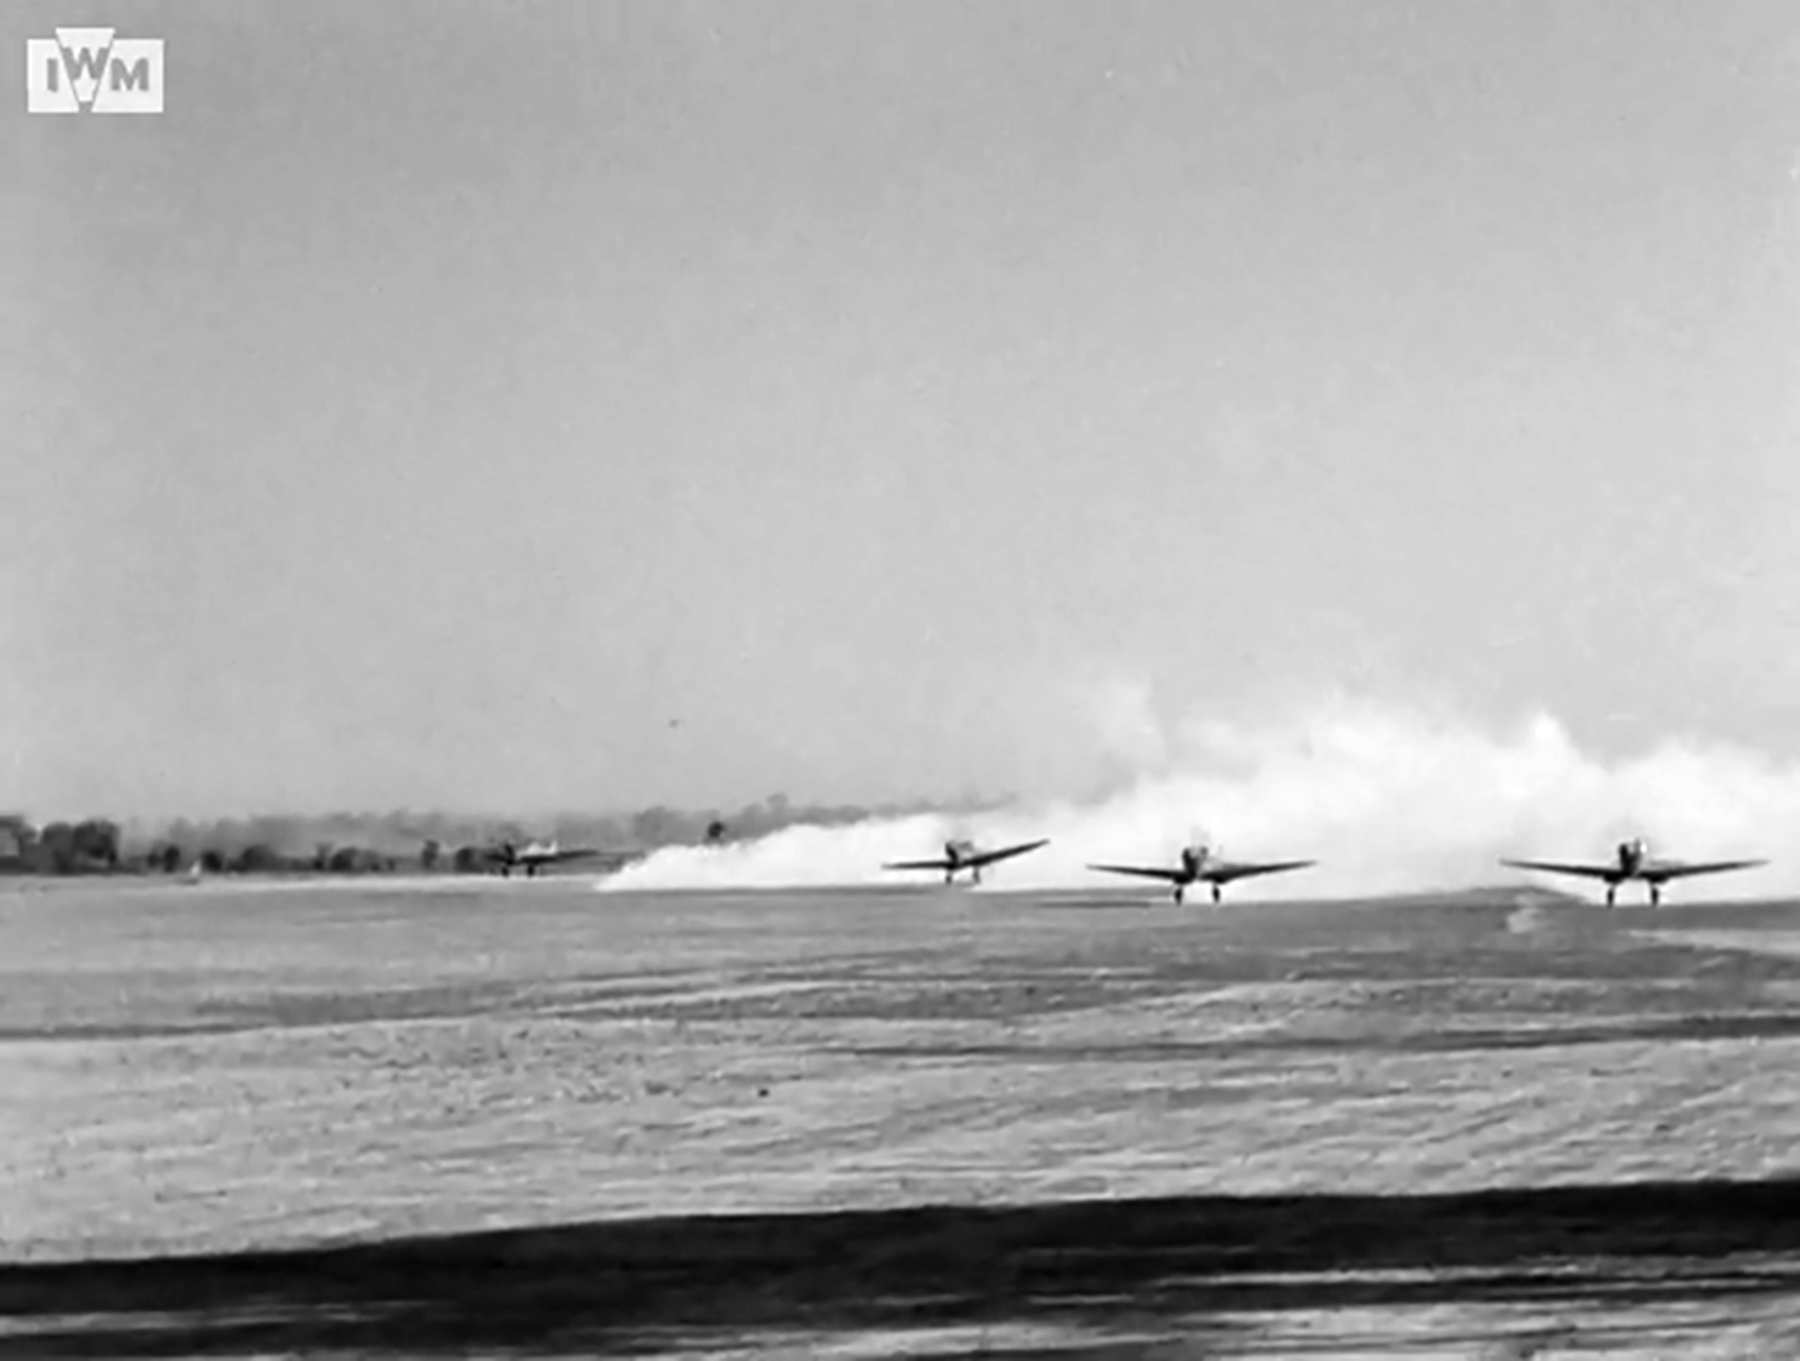 Spitfire VIII RAF 136Sqn in line abreast formation taking off from Rumkhapalong Bangladesh CBI 1944 IWM 01